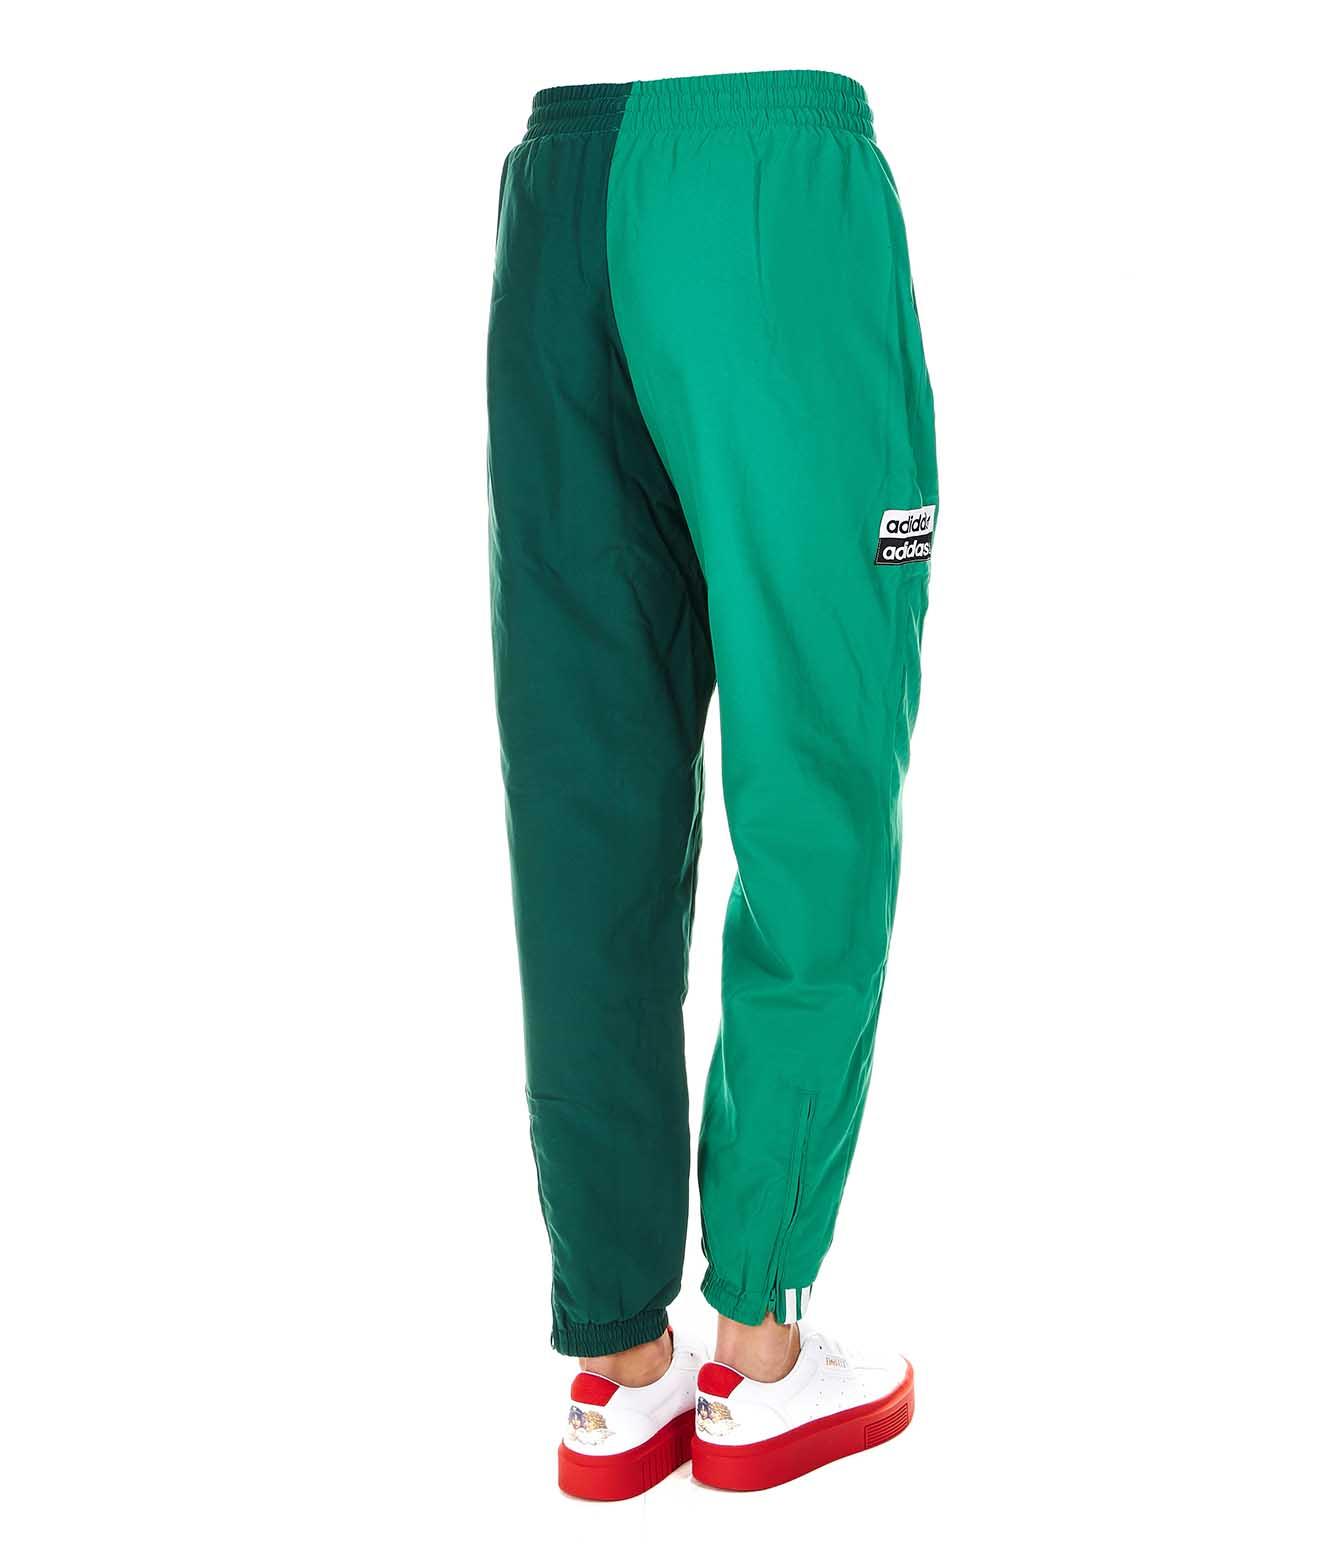 Adidas Originals Pantalone jogging bicolore verde | Maximilian